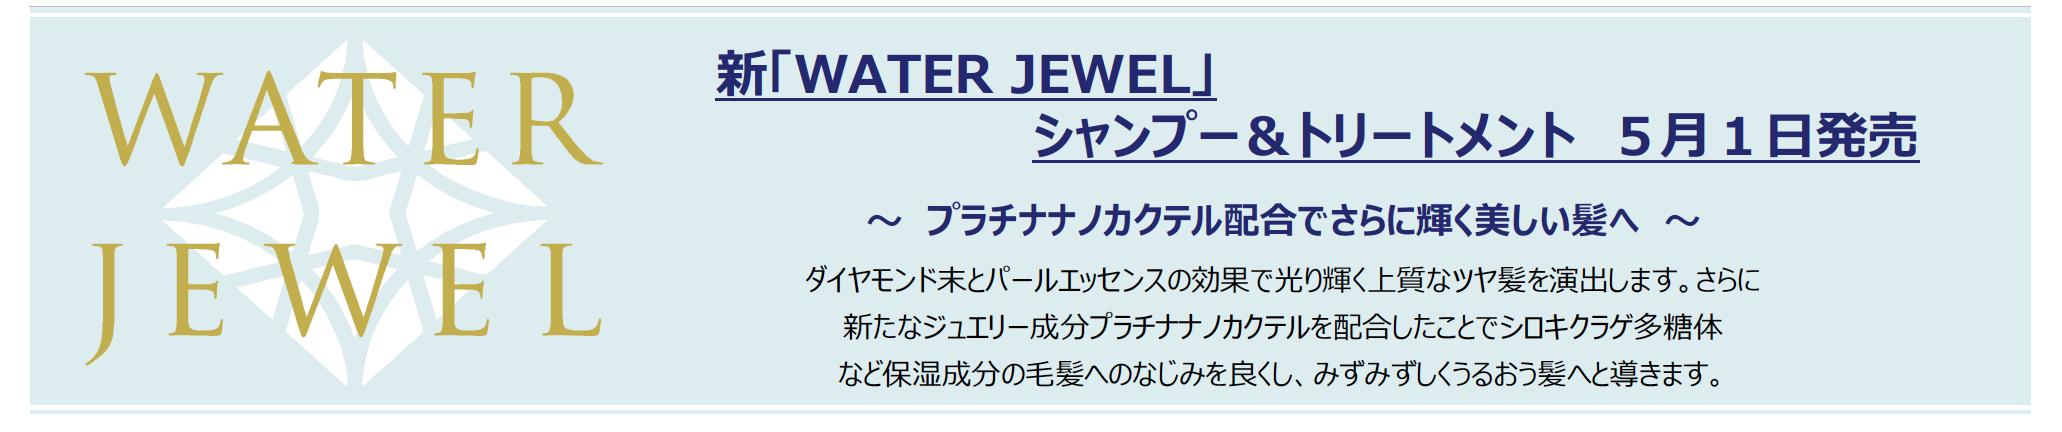 WJ ウォータージュエル 2020シリーズ 詳細01